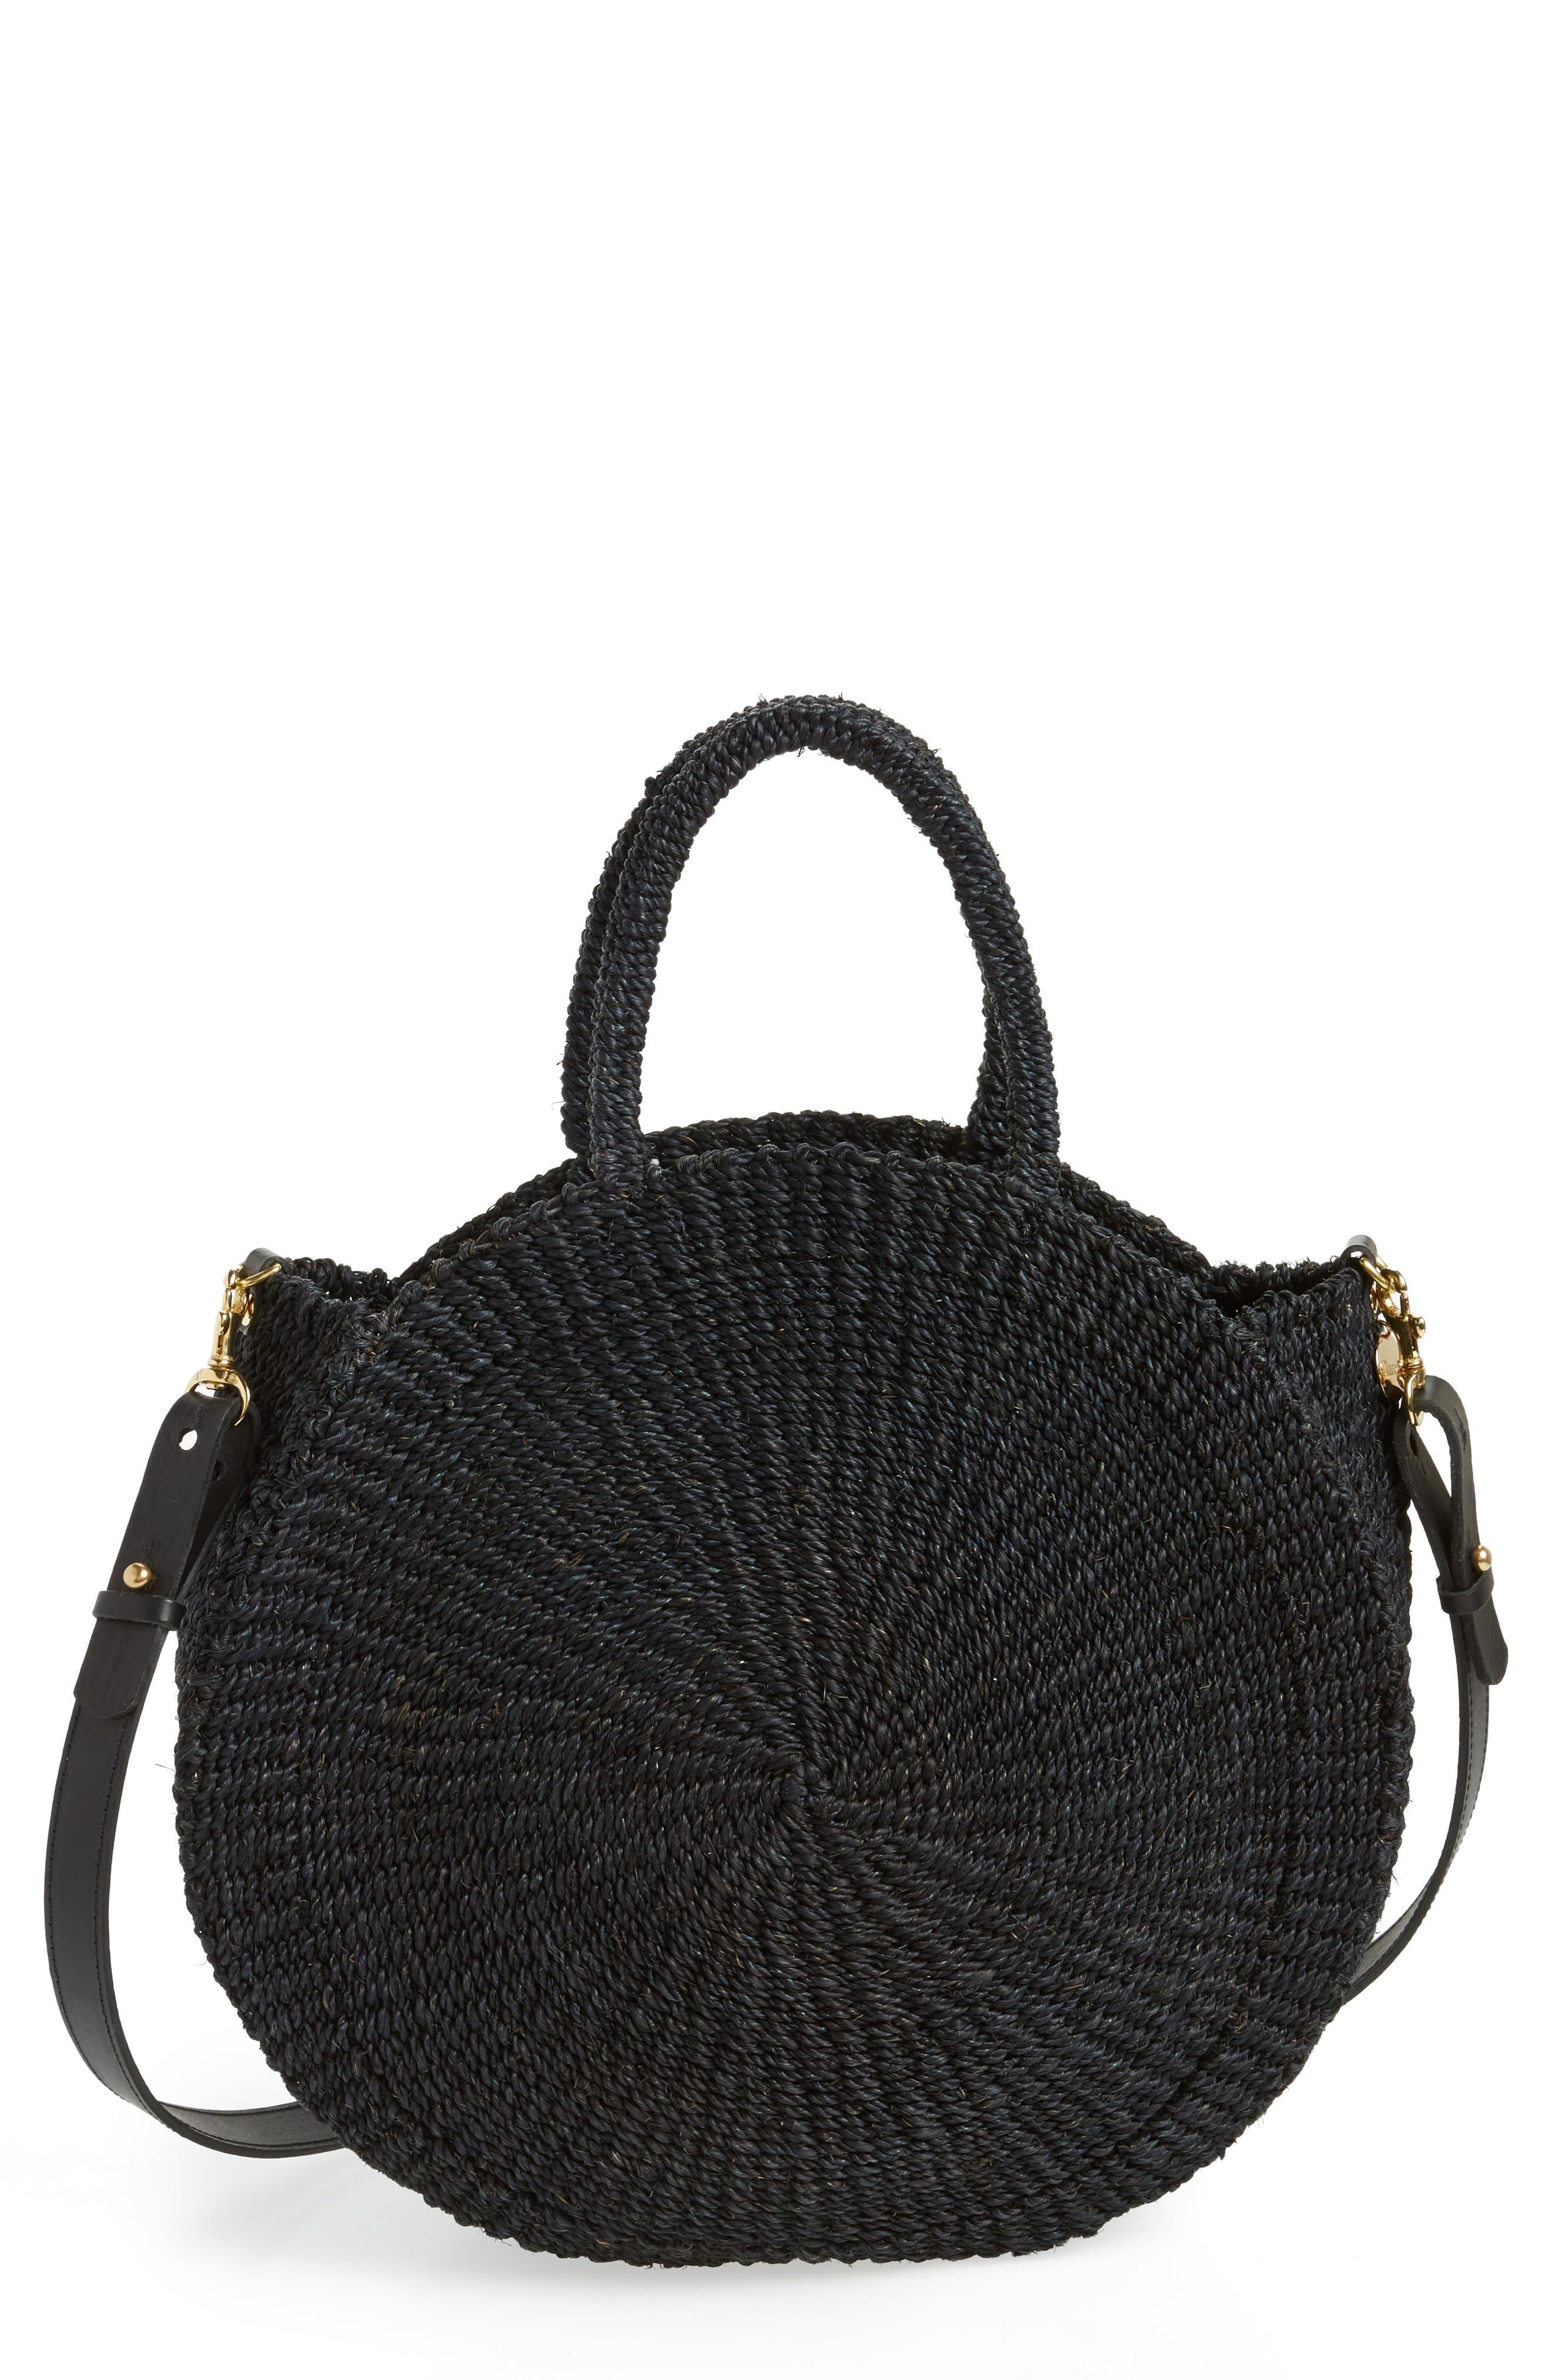 Alice Woven Sisal Straw Bag,                             Main thumbnail 1, color,                             BLACK WOVEN